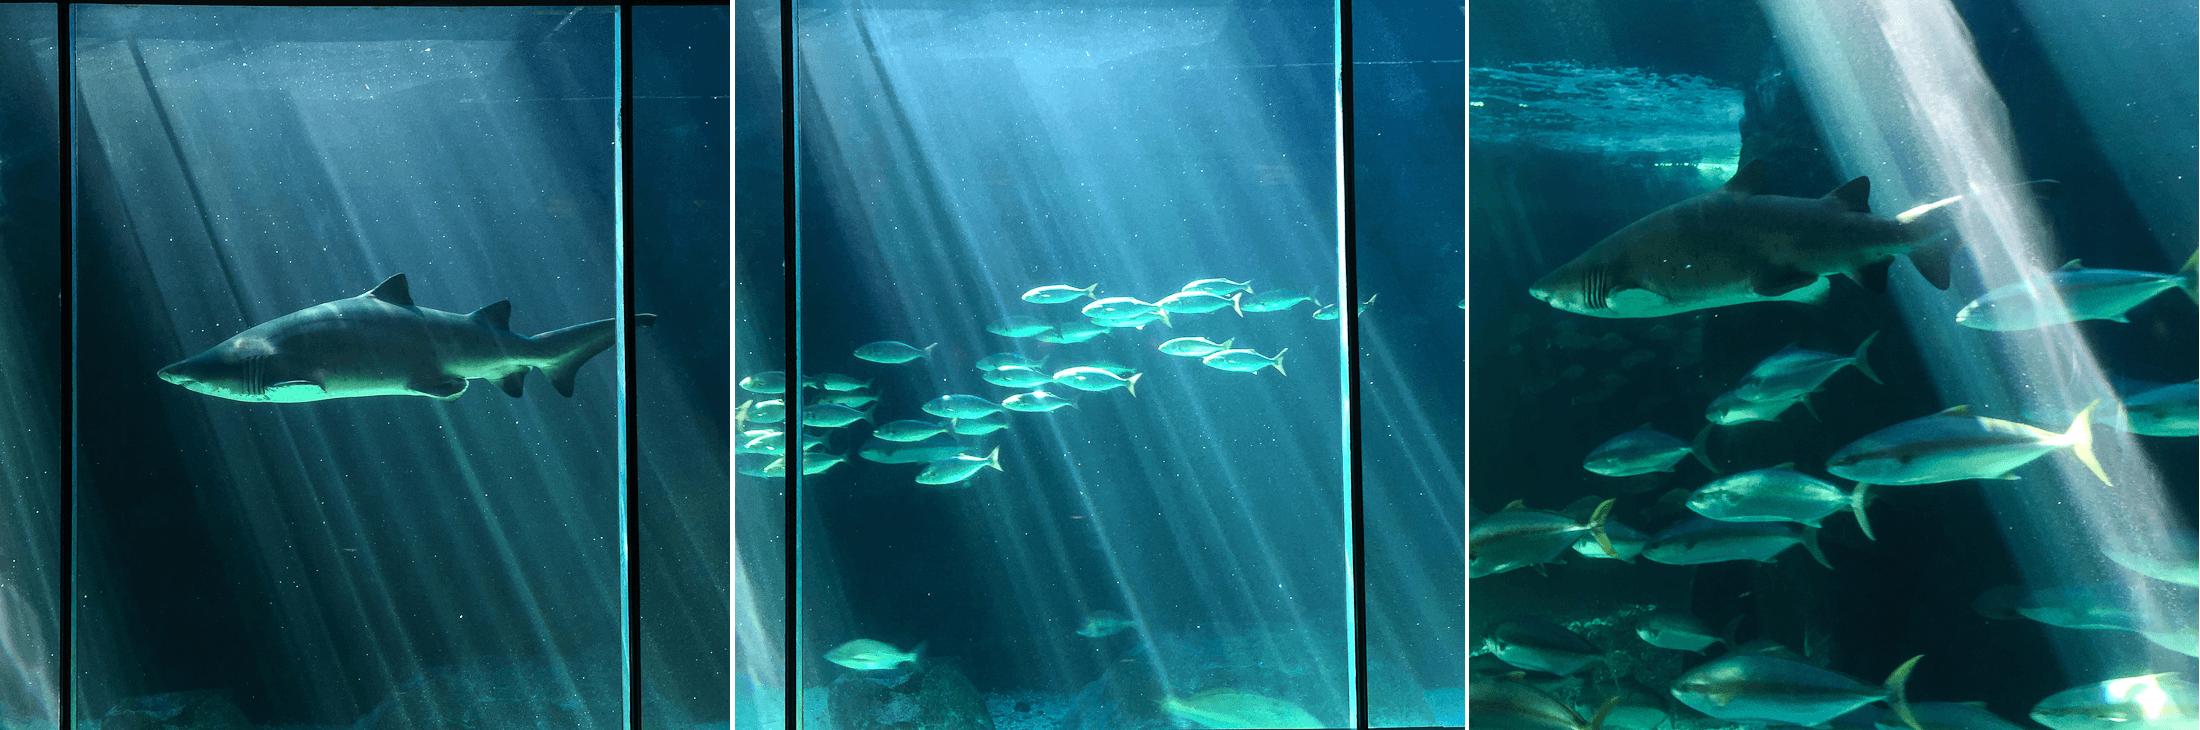 south africa cape town two oceans aquarium diving sharks penguins victoria